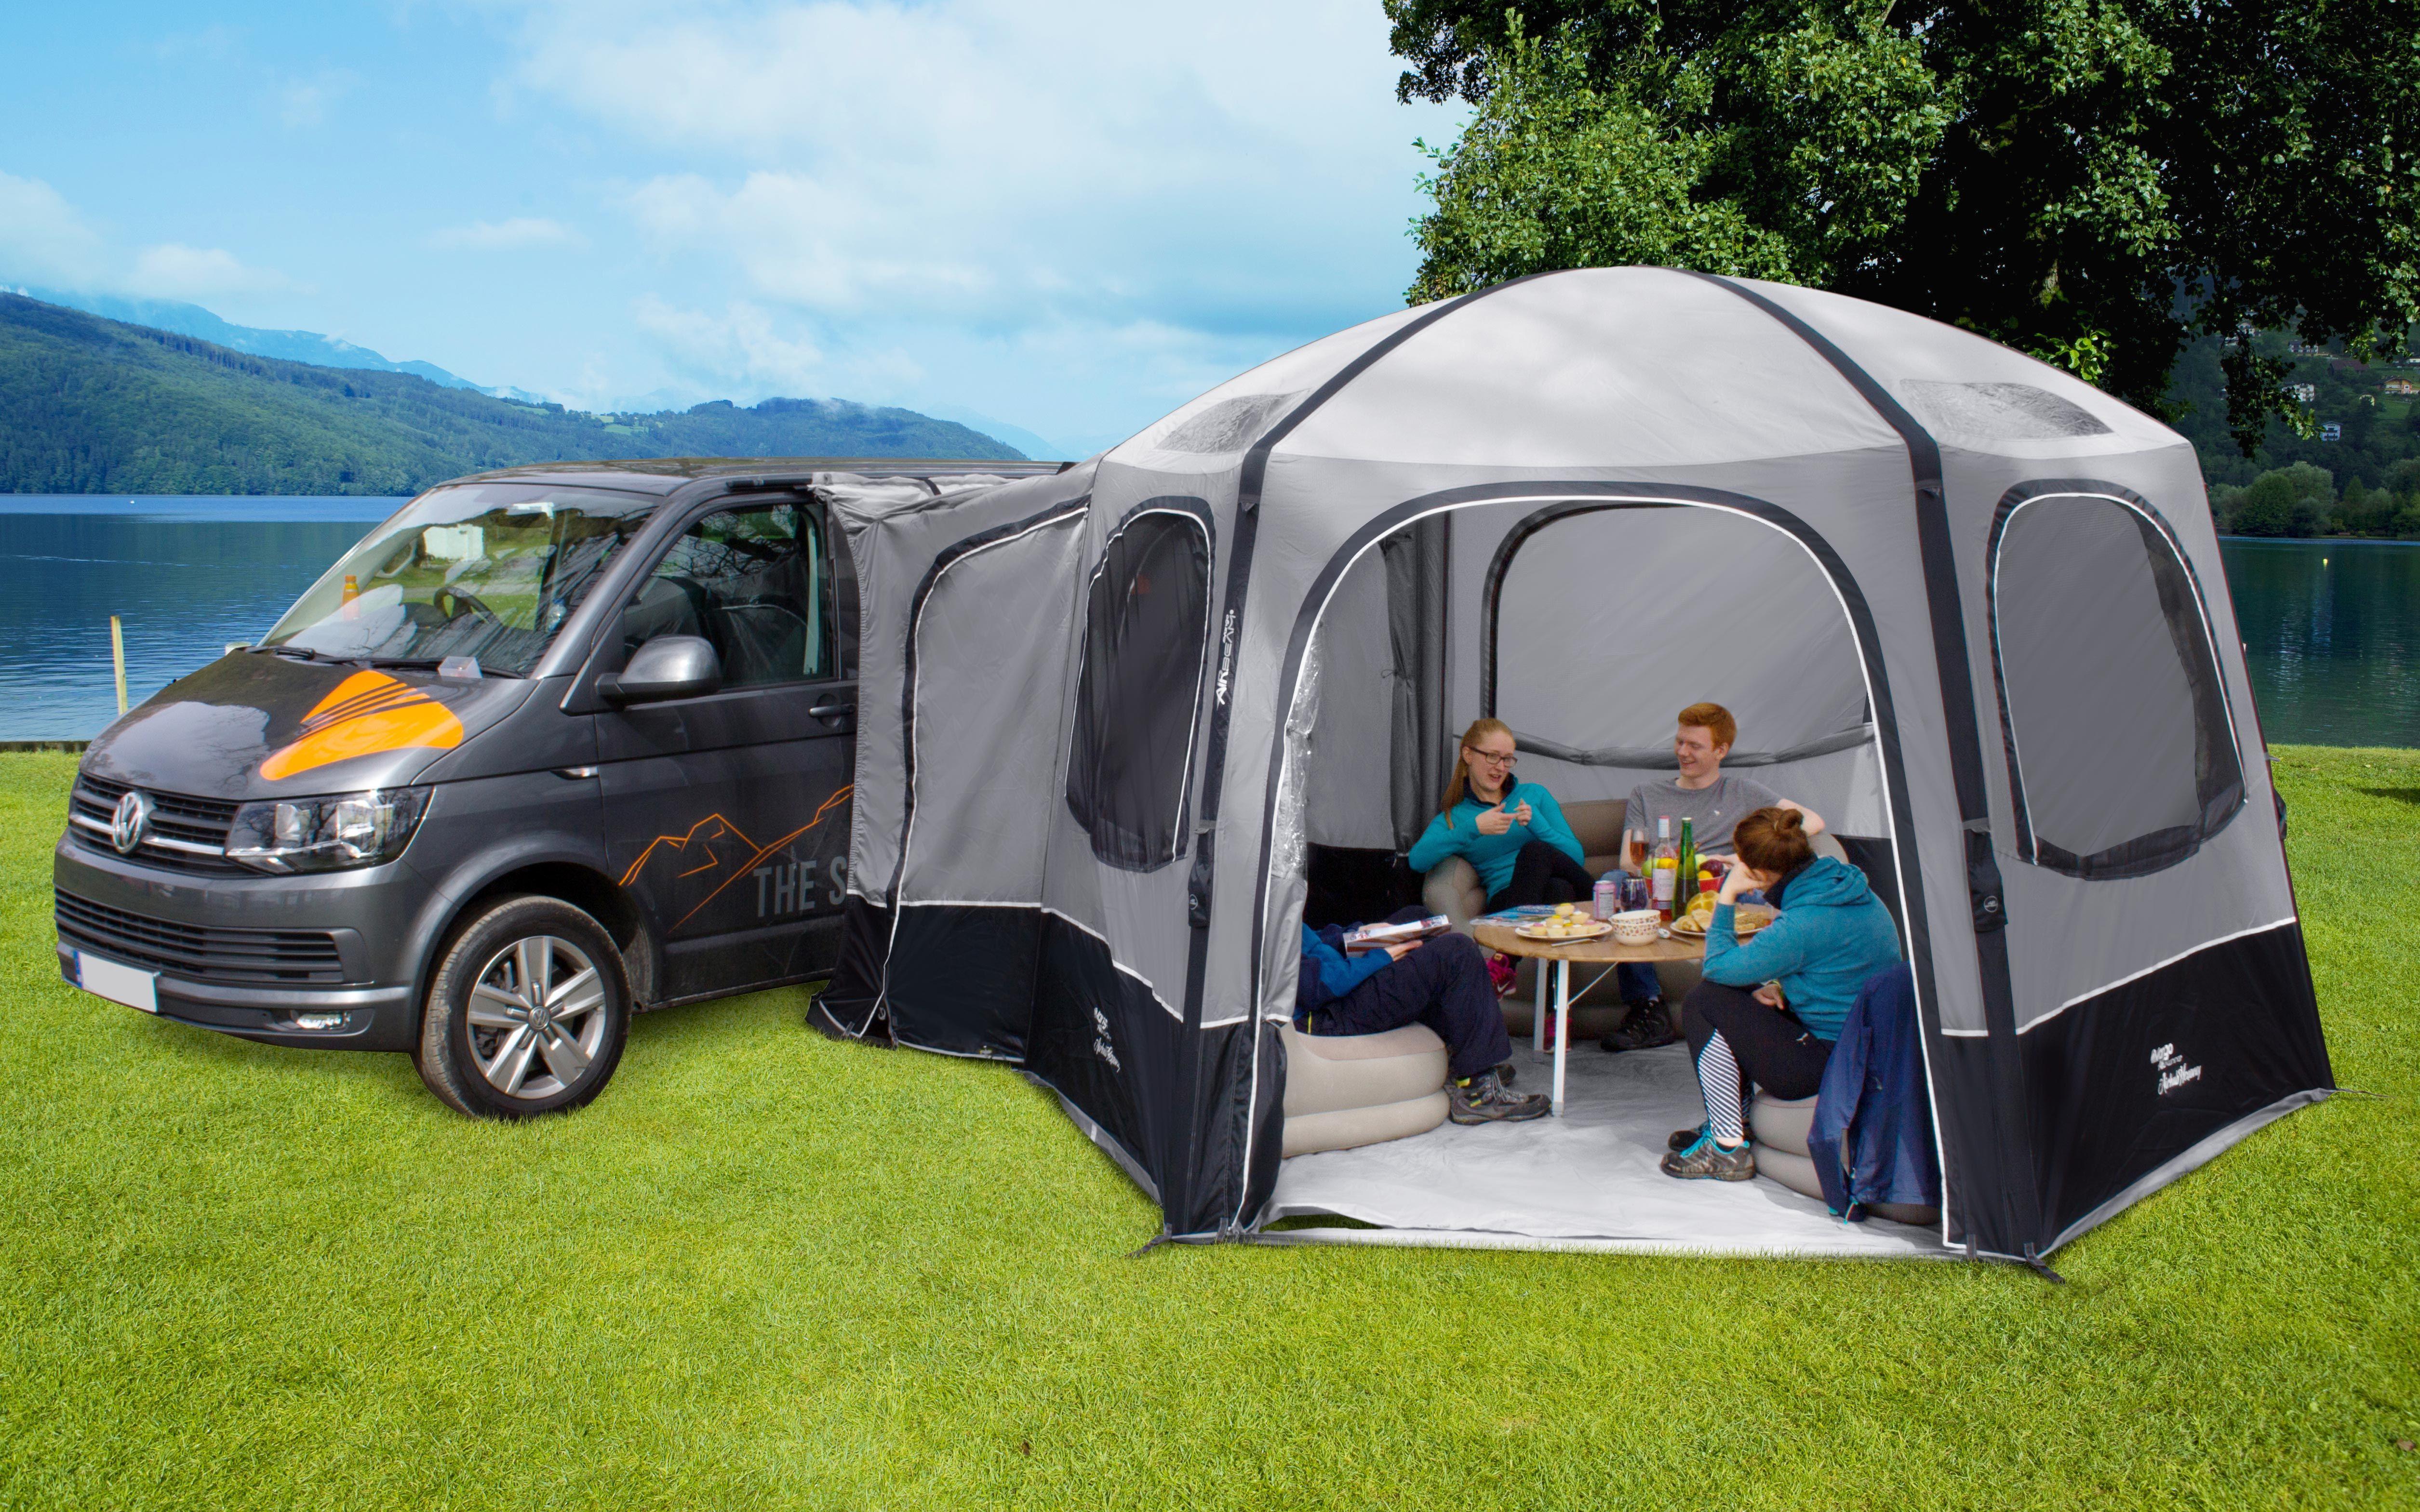 Busvorzelte #Camping #Vorzelte #Zelte #Vango #Busvorzelt